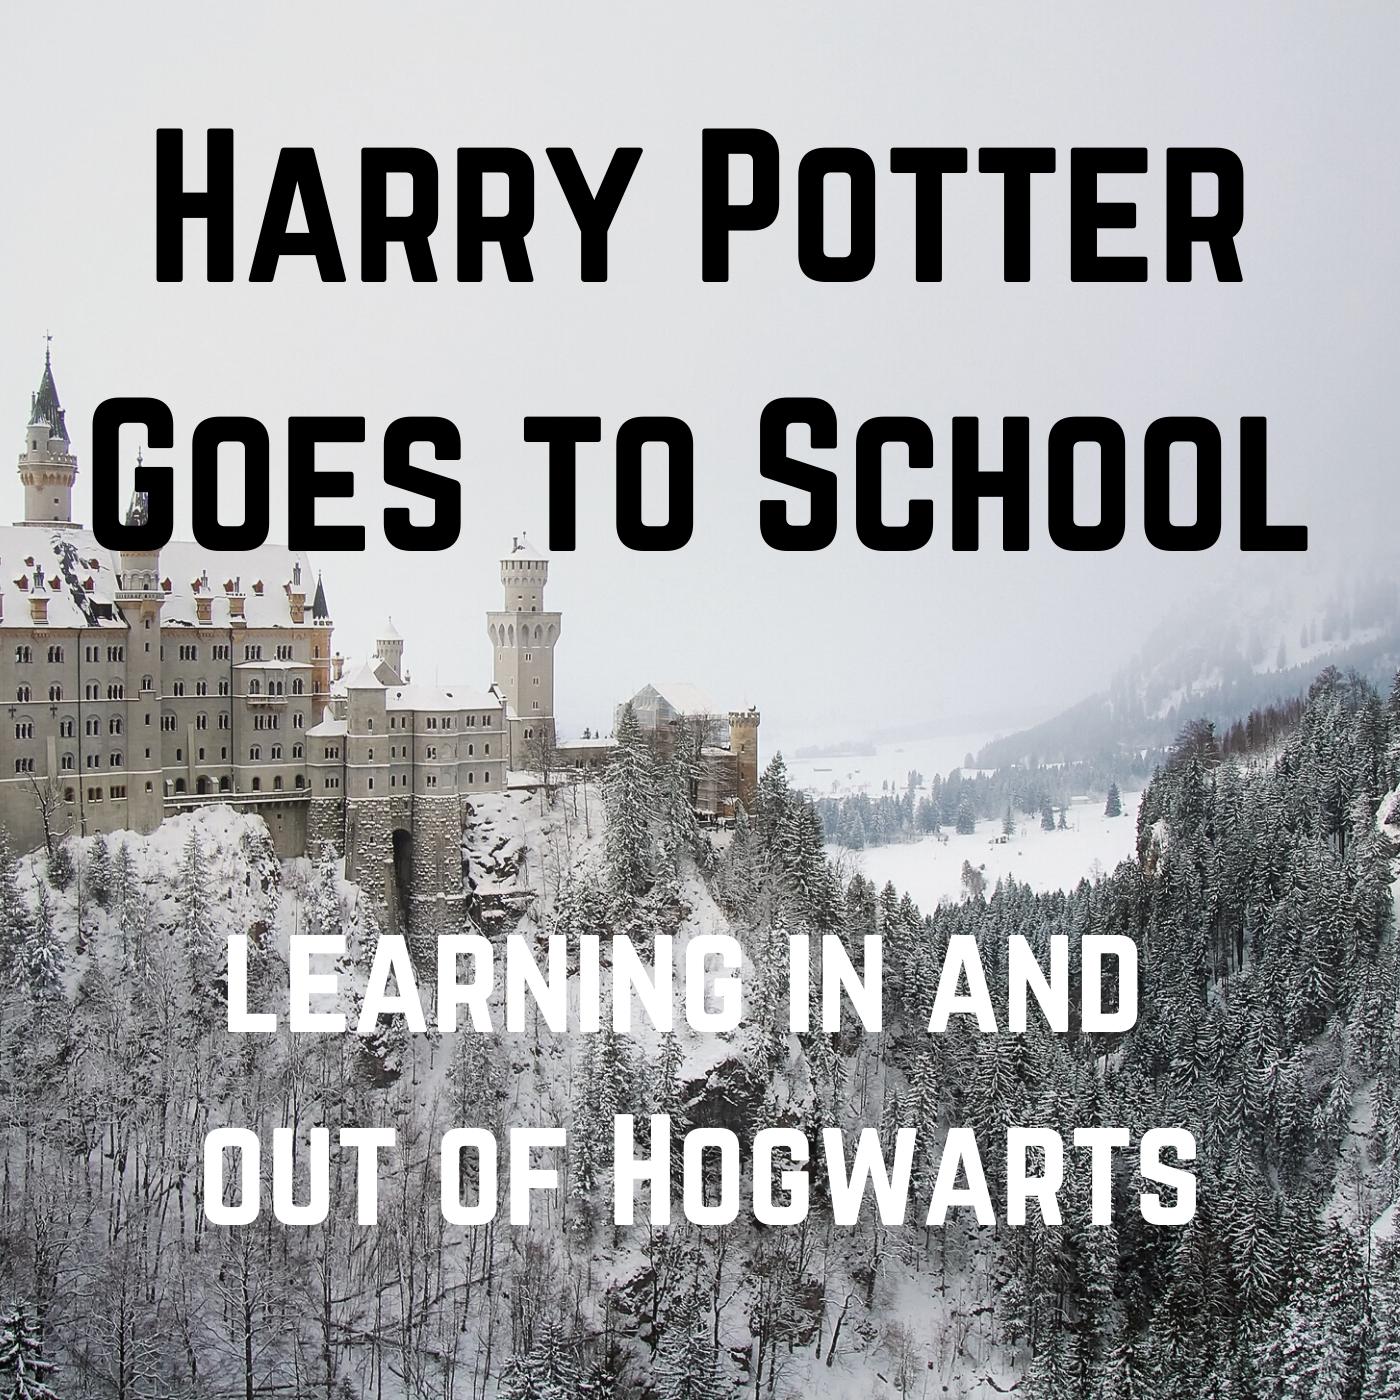 Harry Potter Goes to School show art